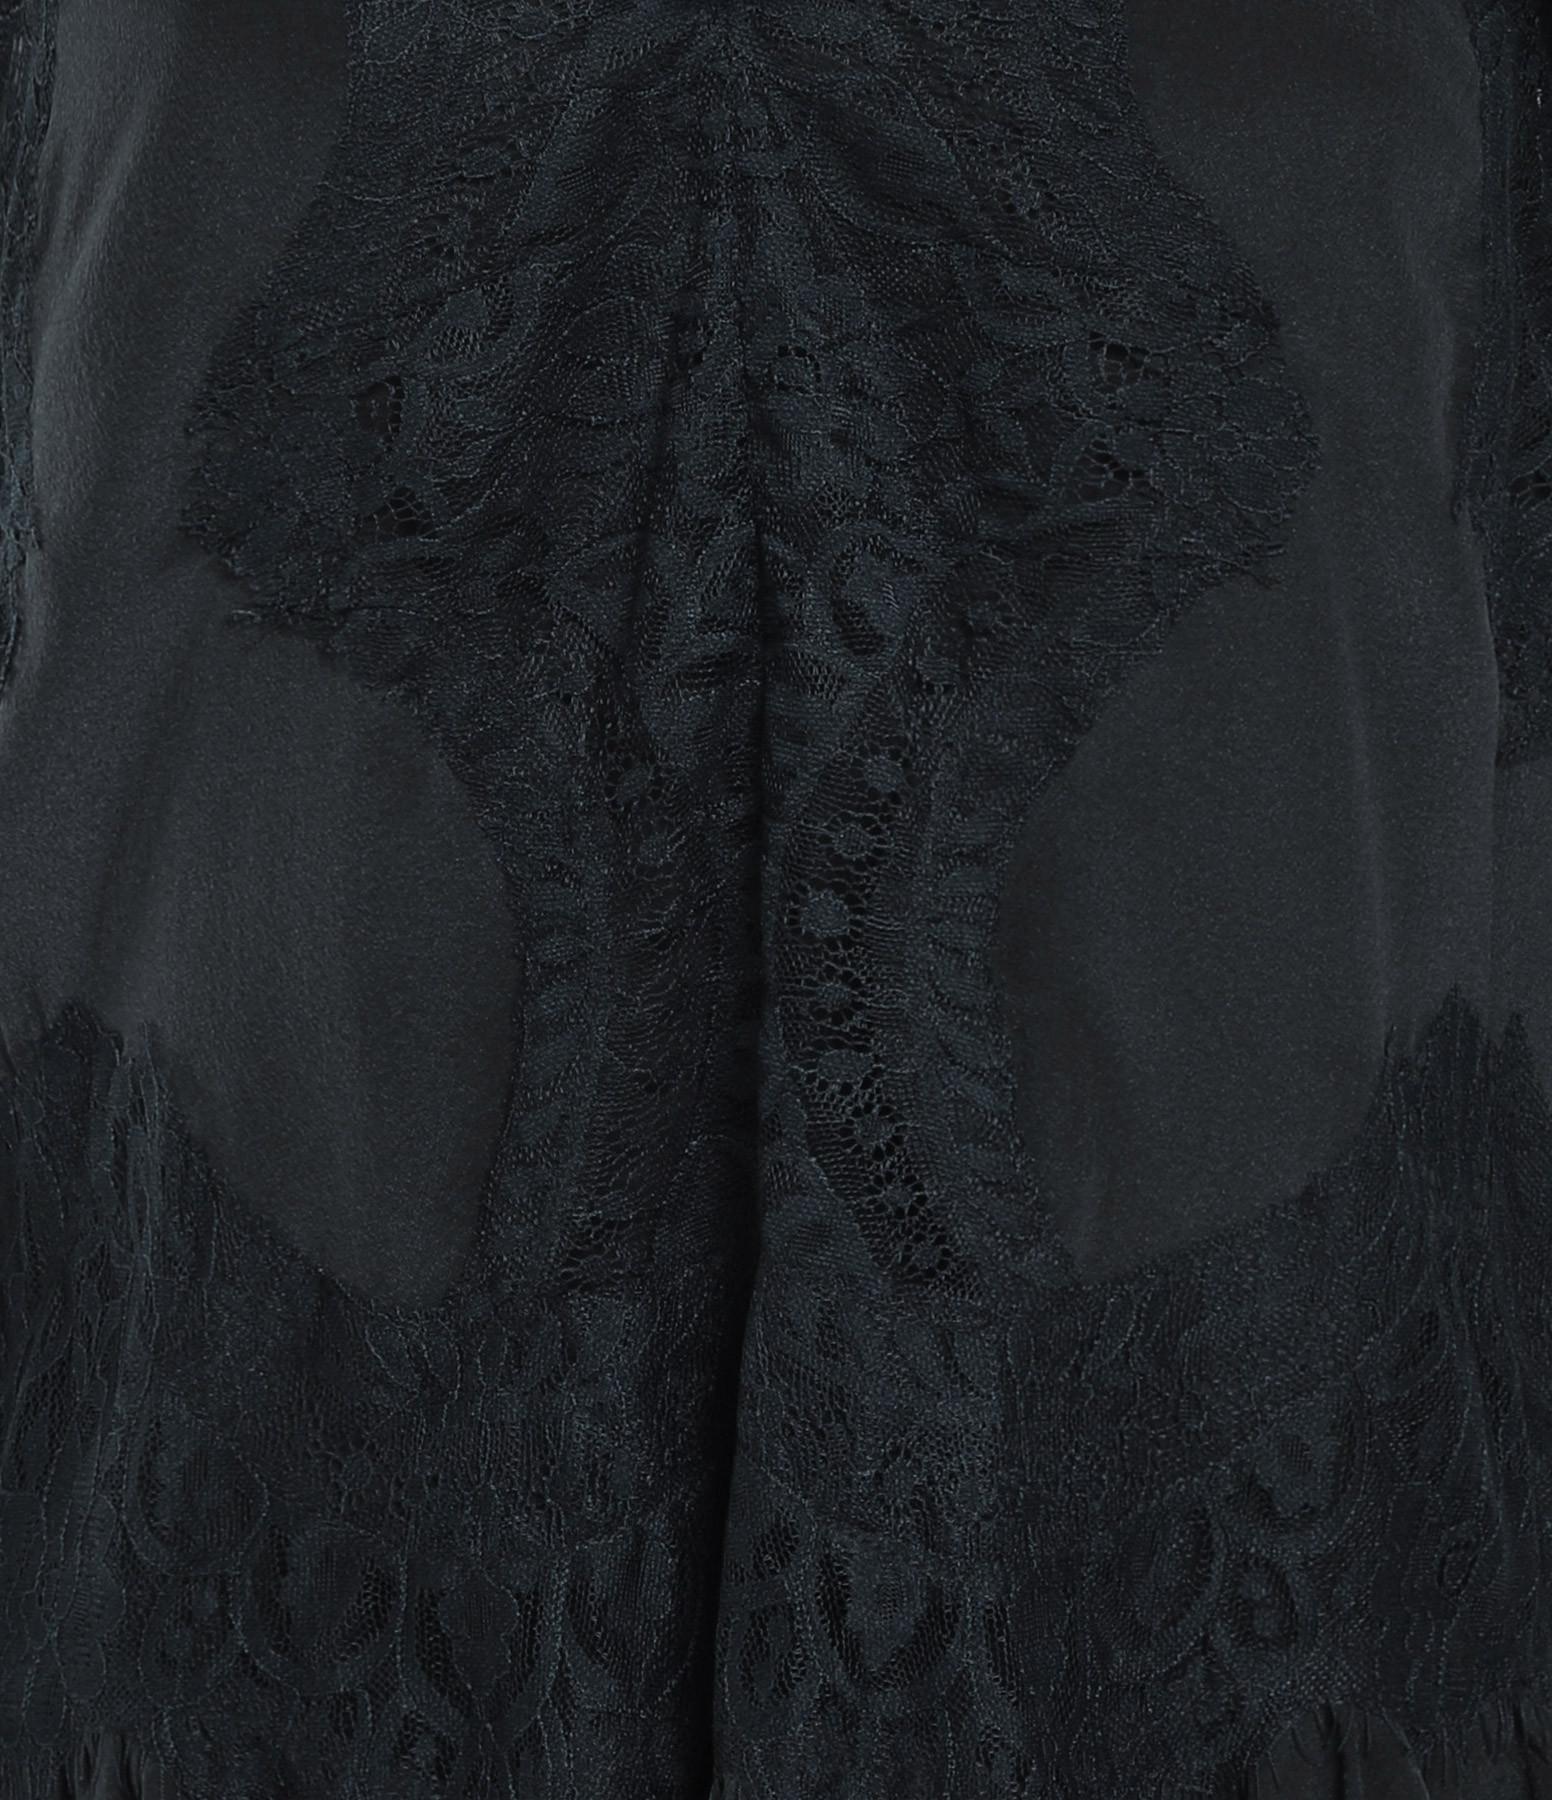 MAGALI PASCAL - Robe Gabrielle Soie Bleu Nuit